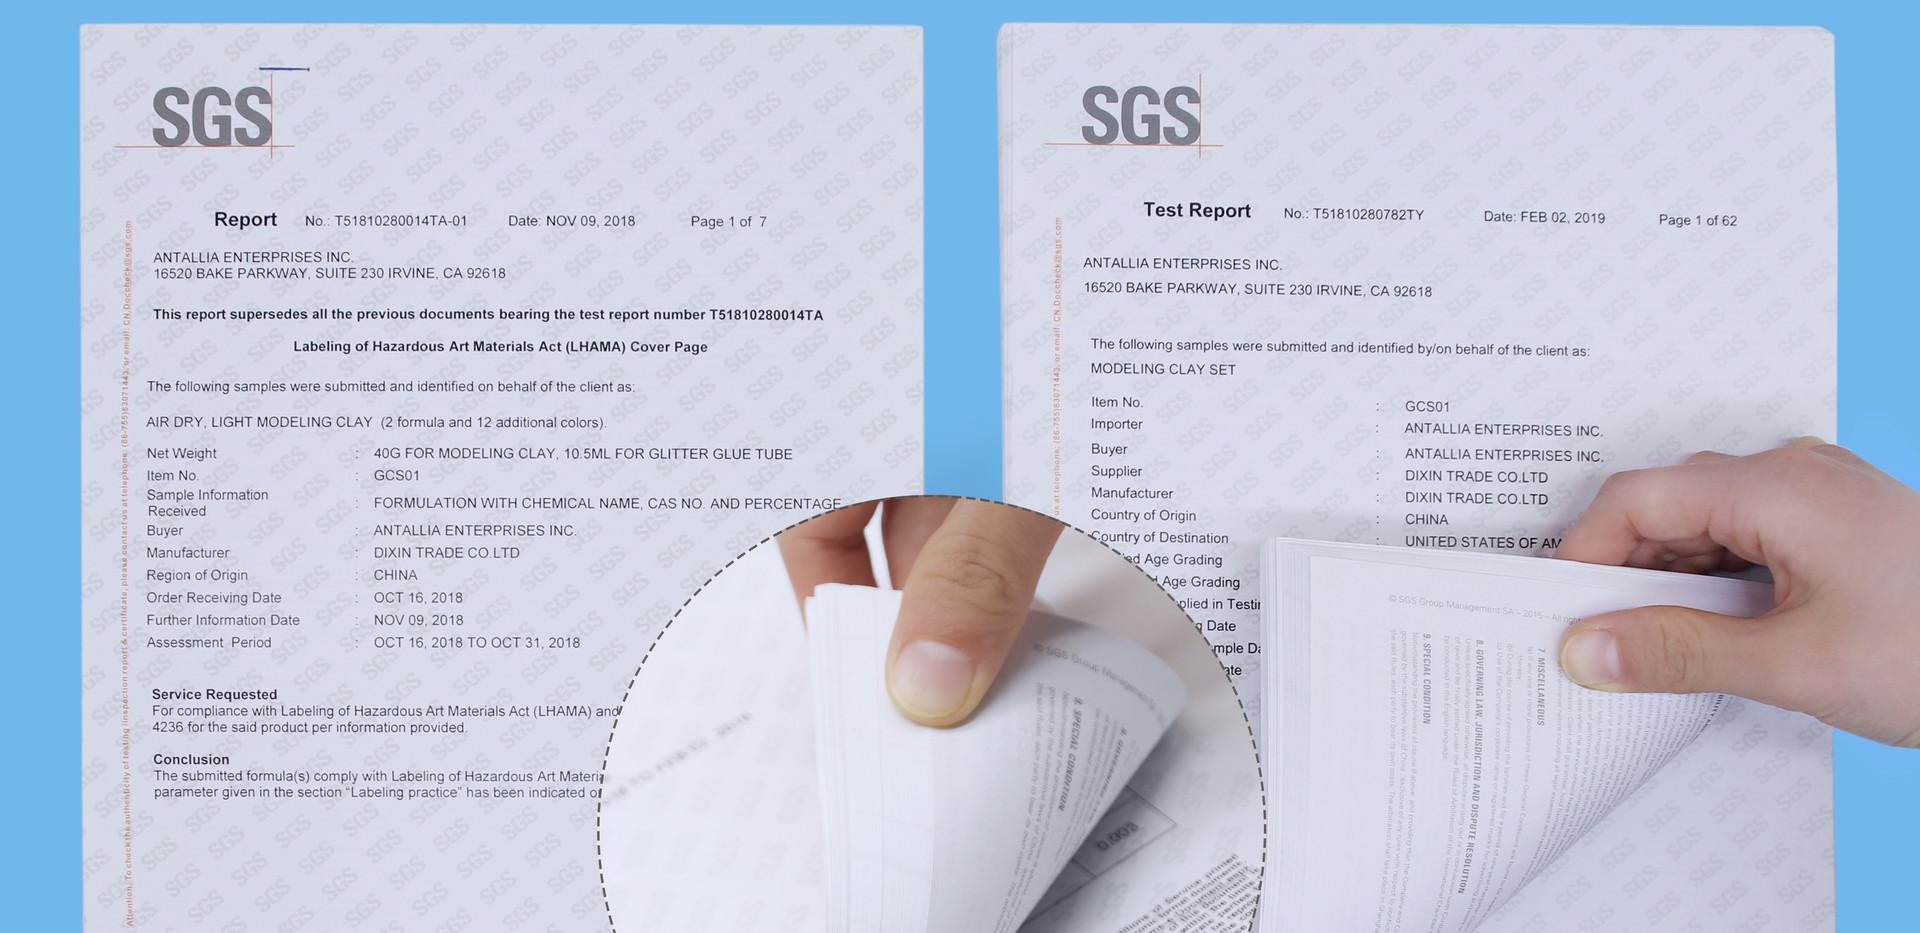 SGS REPORT.jpg